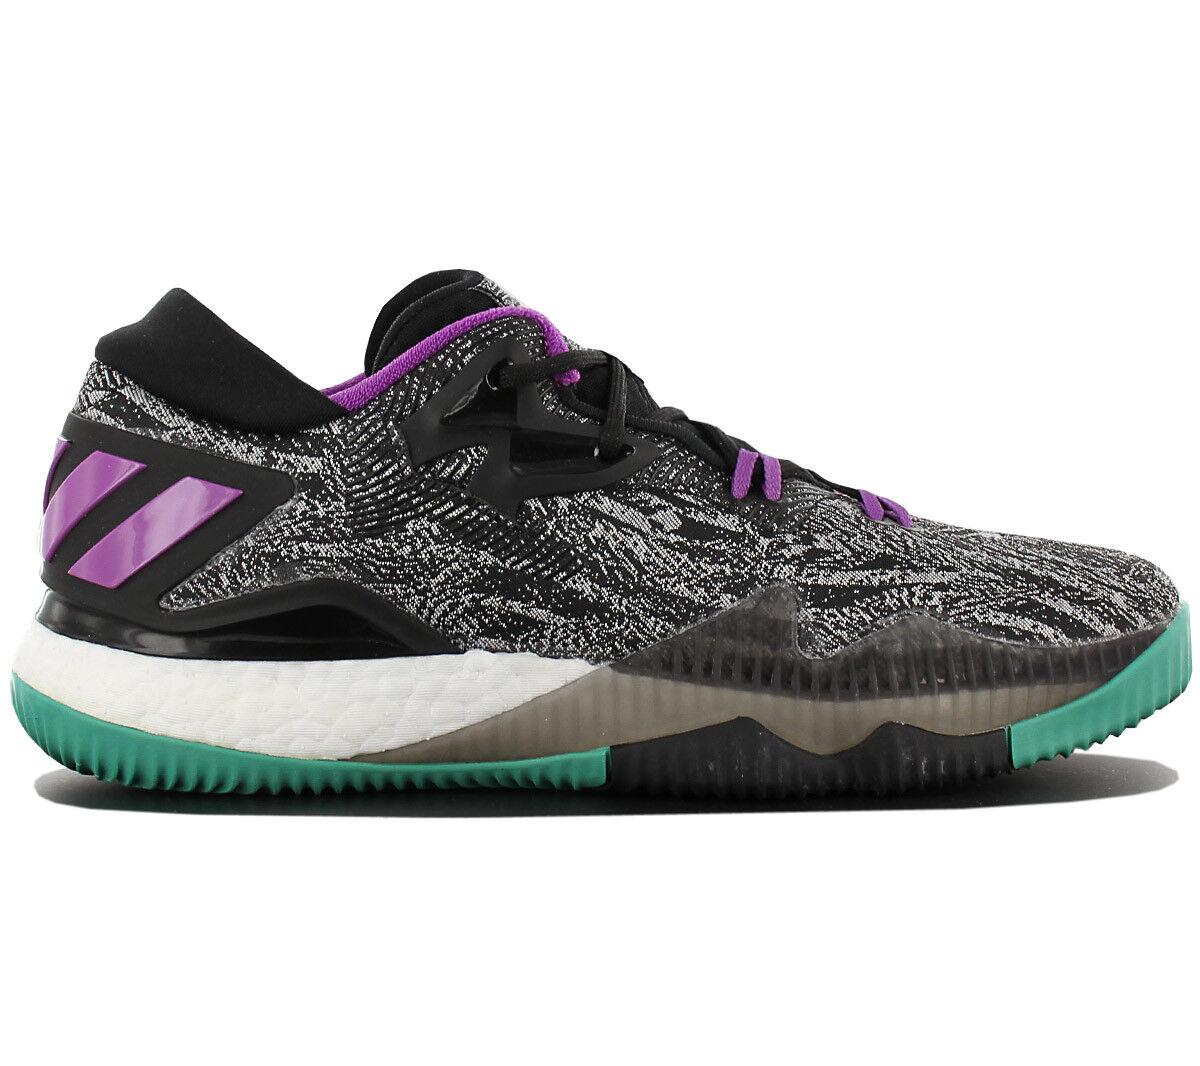 Adidas Crazylight Boost Low 2016 Uomo Basket Sautopa Basket AQ7762 Sautope classeiche da uomo